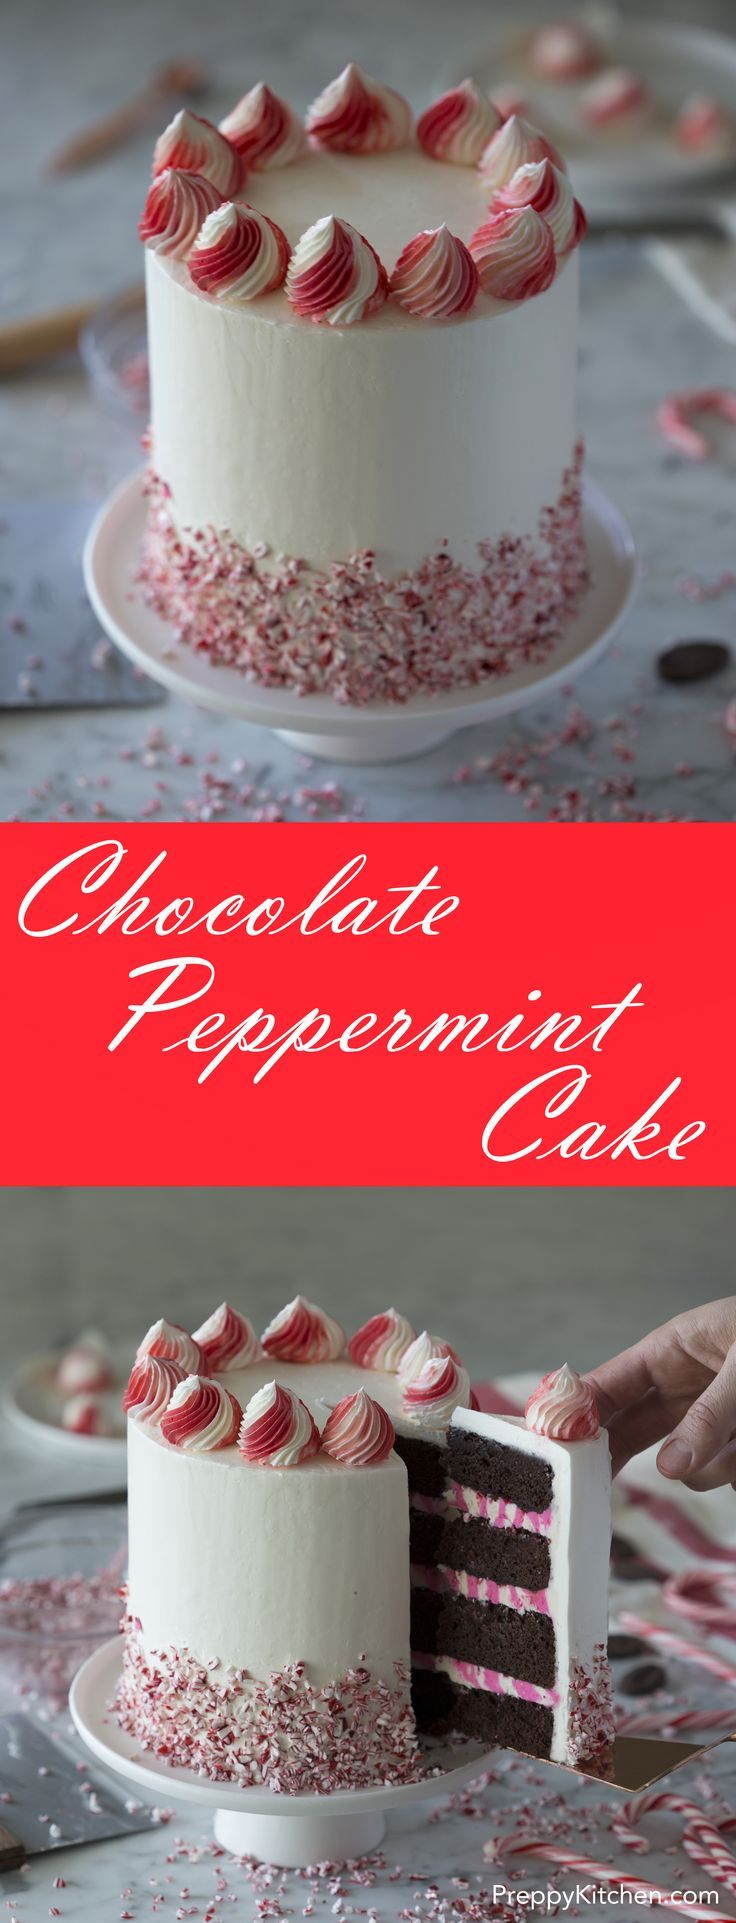 Chocolate Peppermint Cake via /preppykitchen/